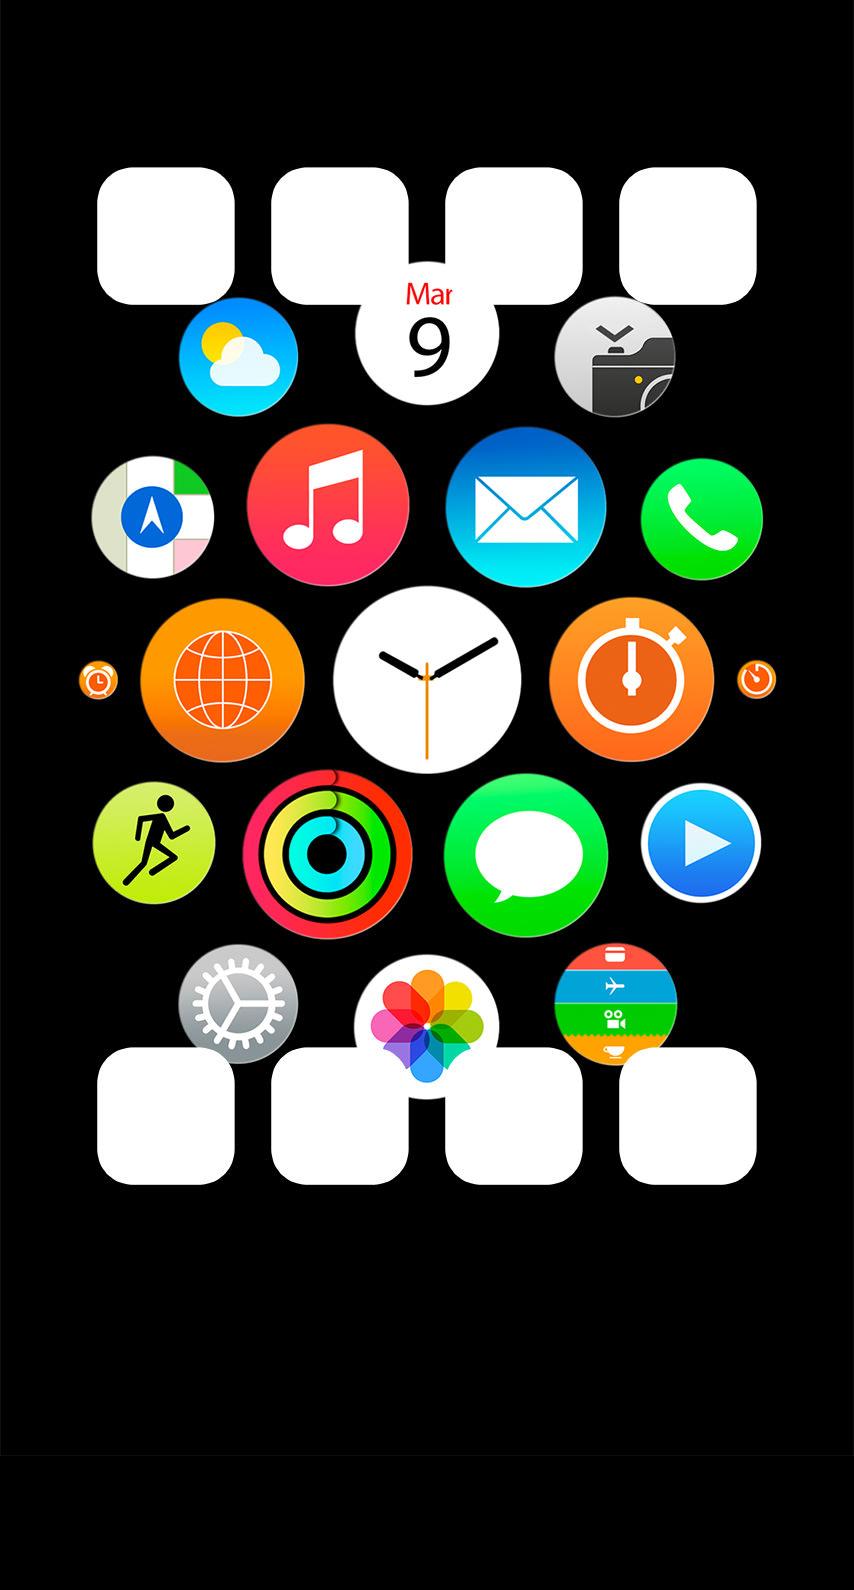 Wallpaper iphone hitam - Iphone 7 Wallpaper